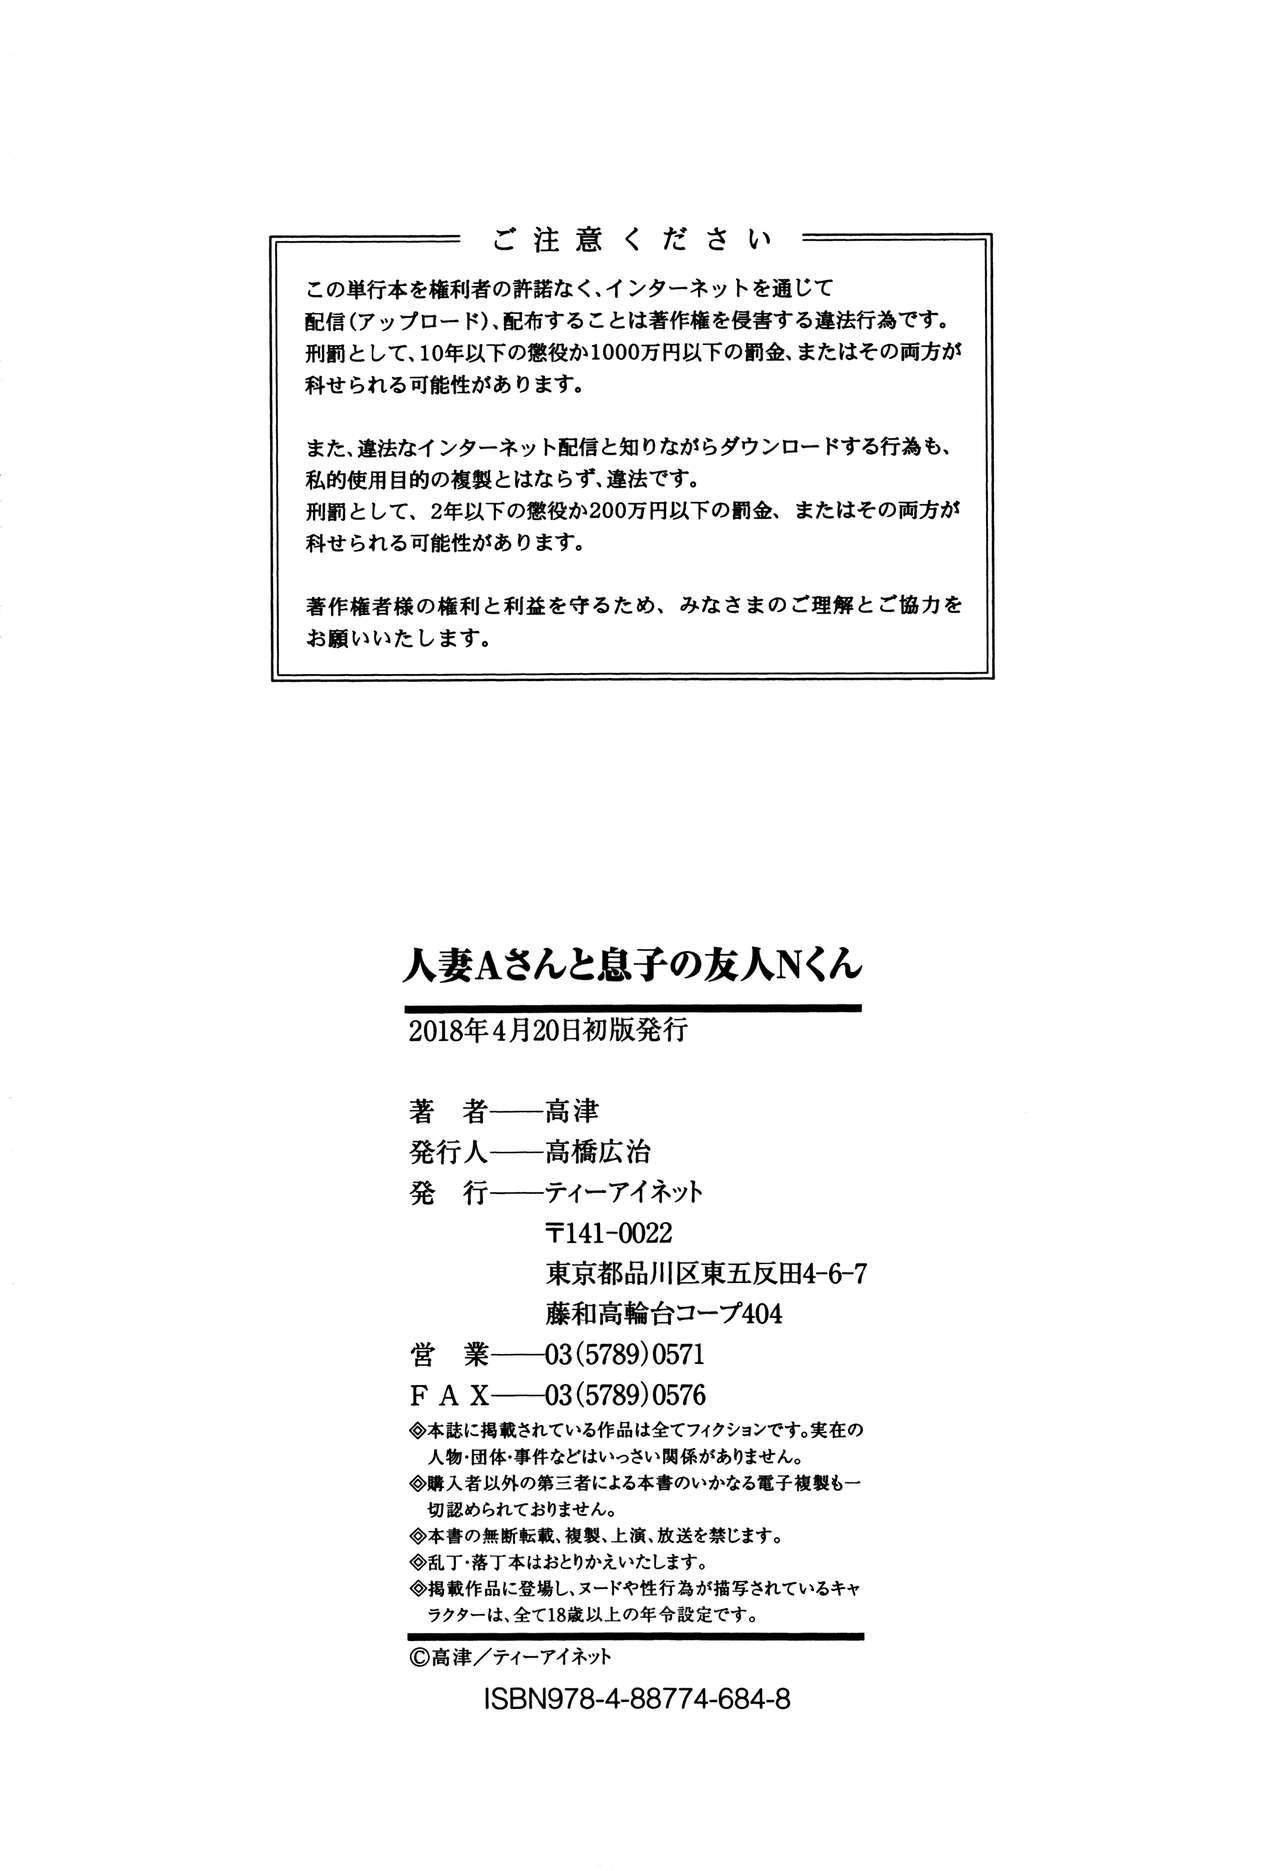 [Takatsu] Hitozuma A-san to Musuko no Yuujin N-kun - Married wife A and son's friend N-kun [English] 206